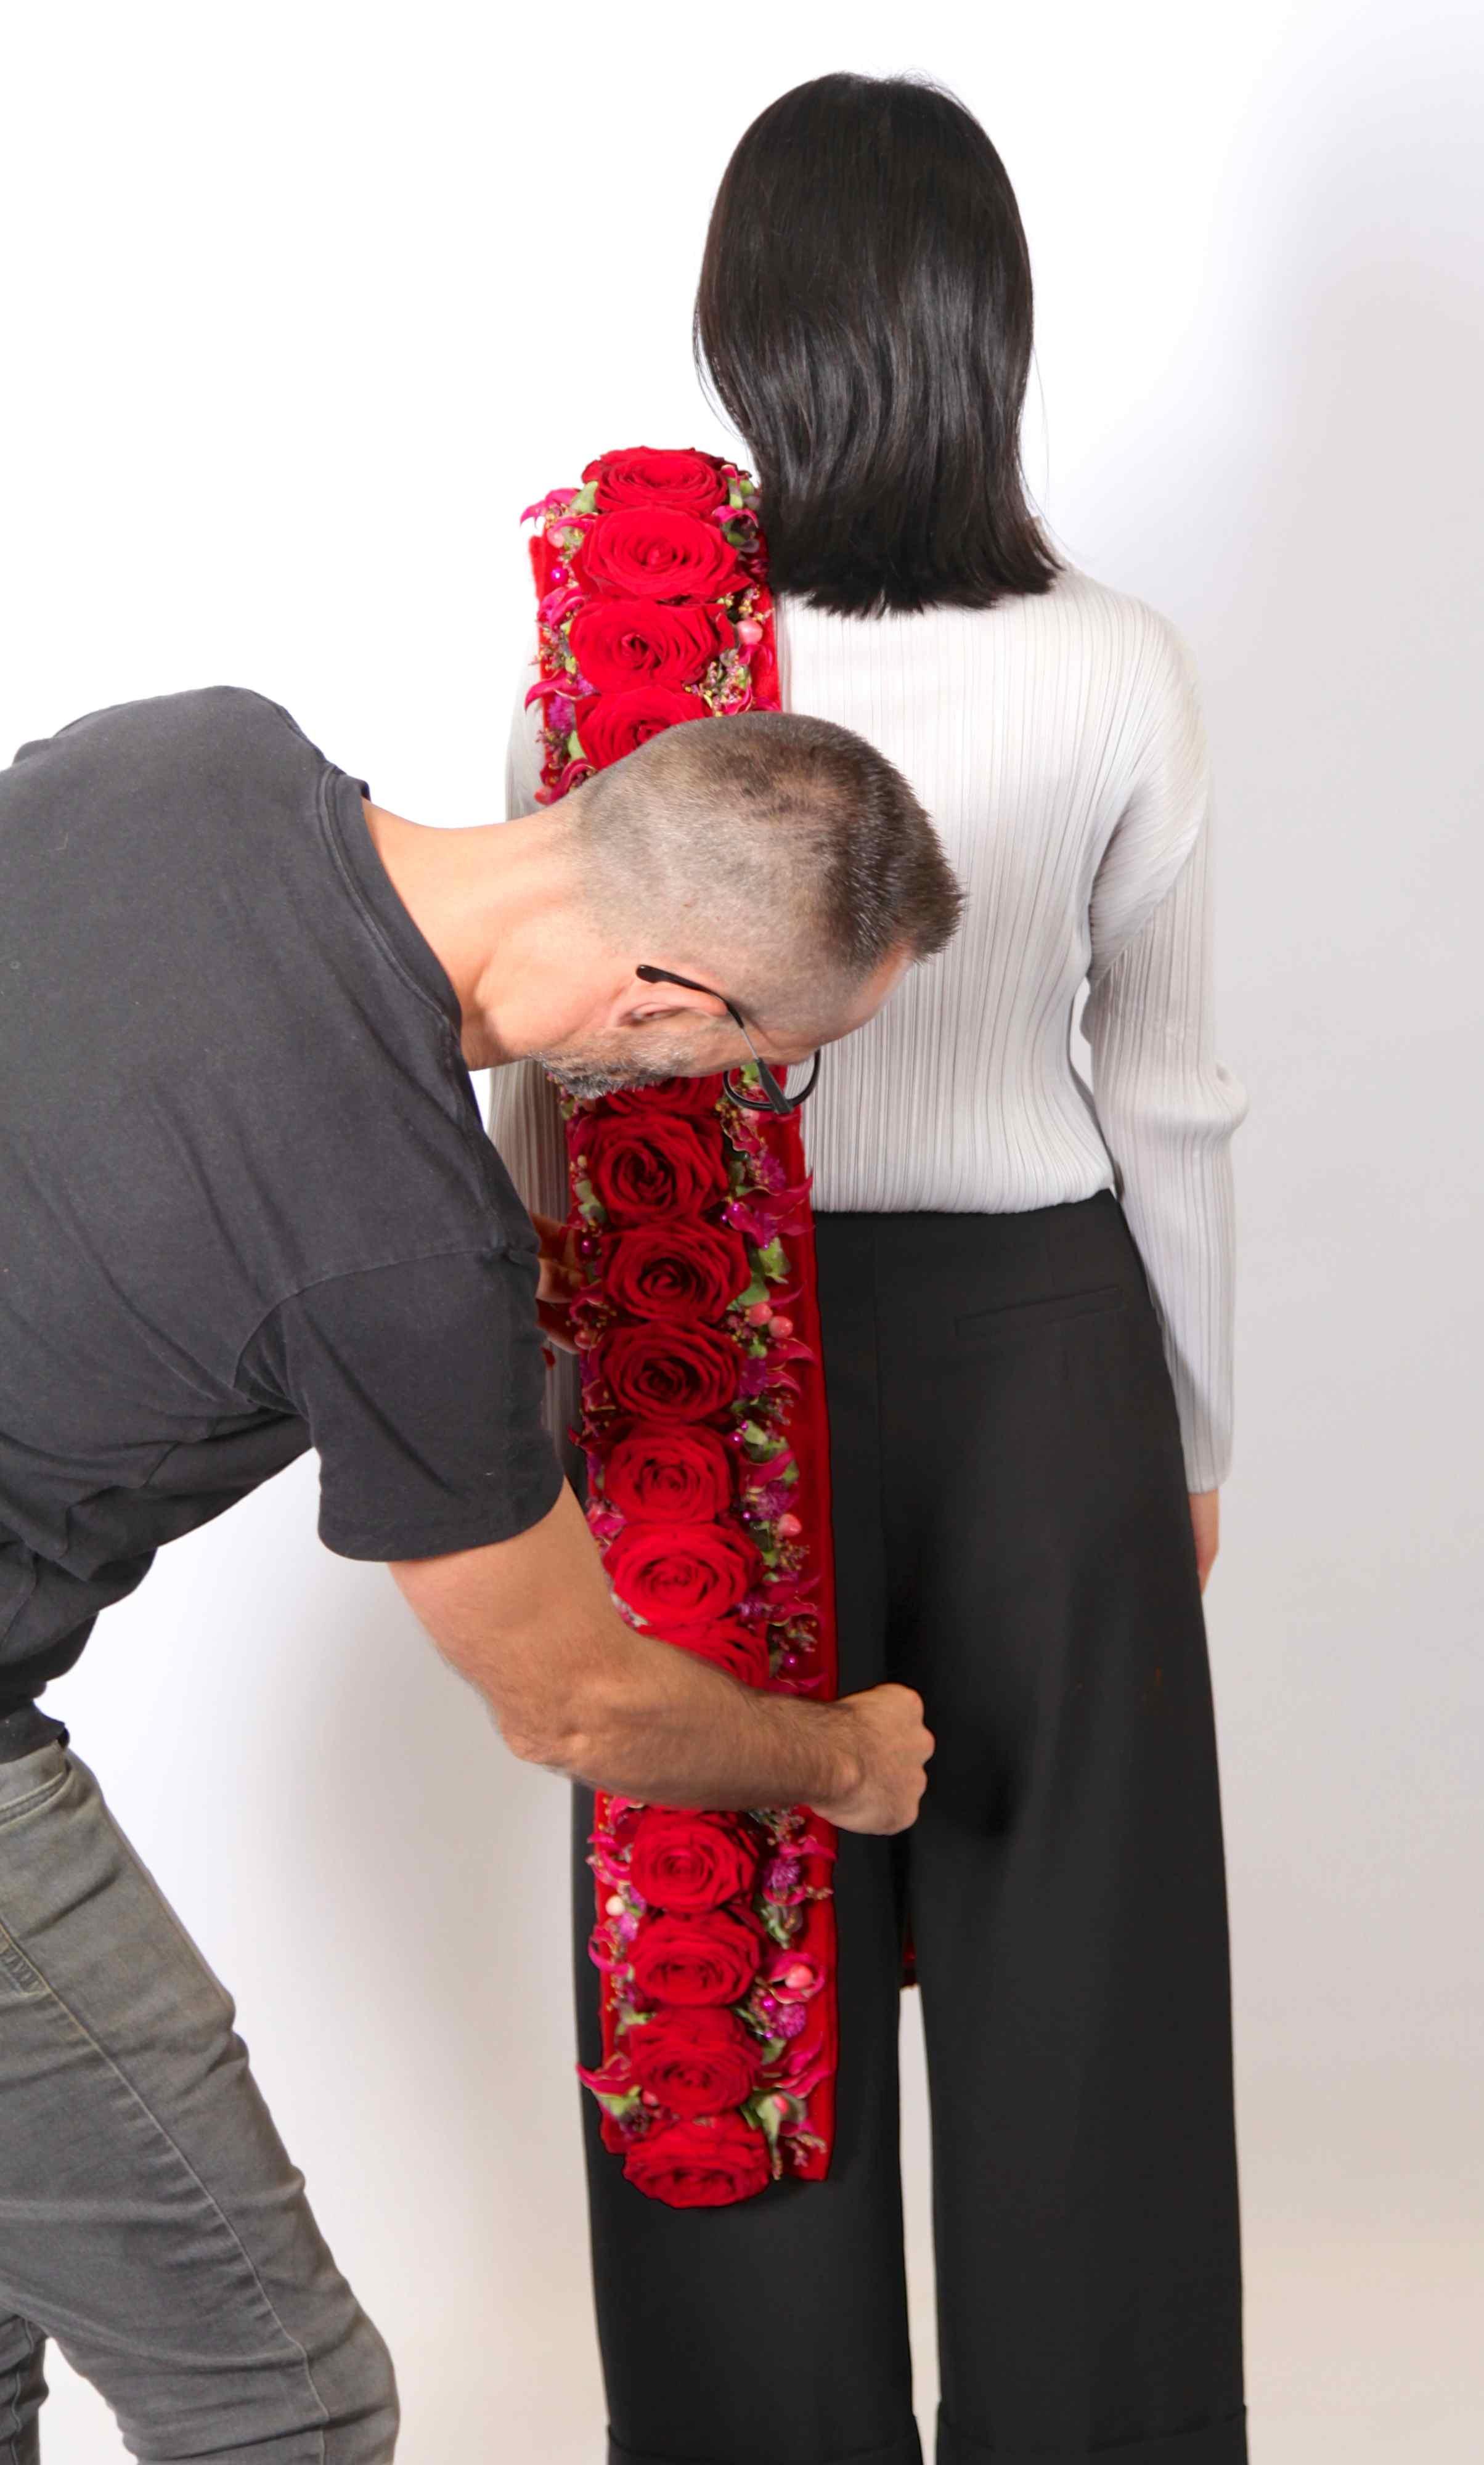 red naomi love will keep you warm by alex segura